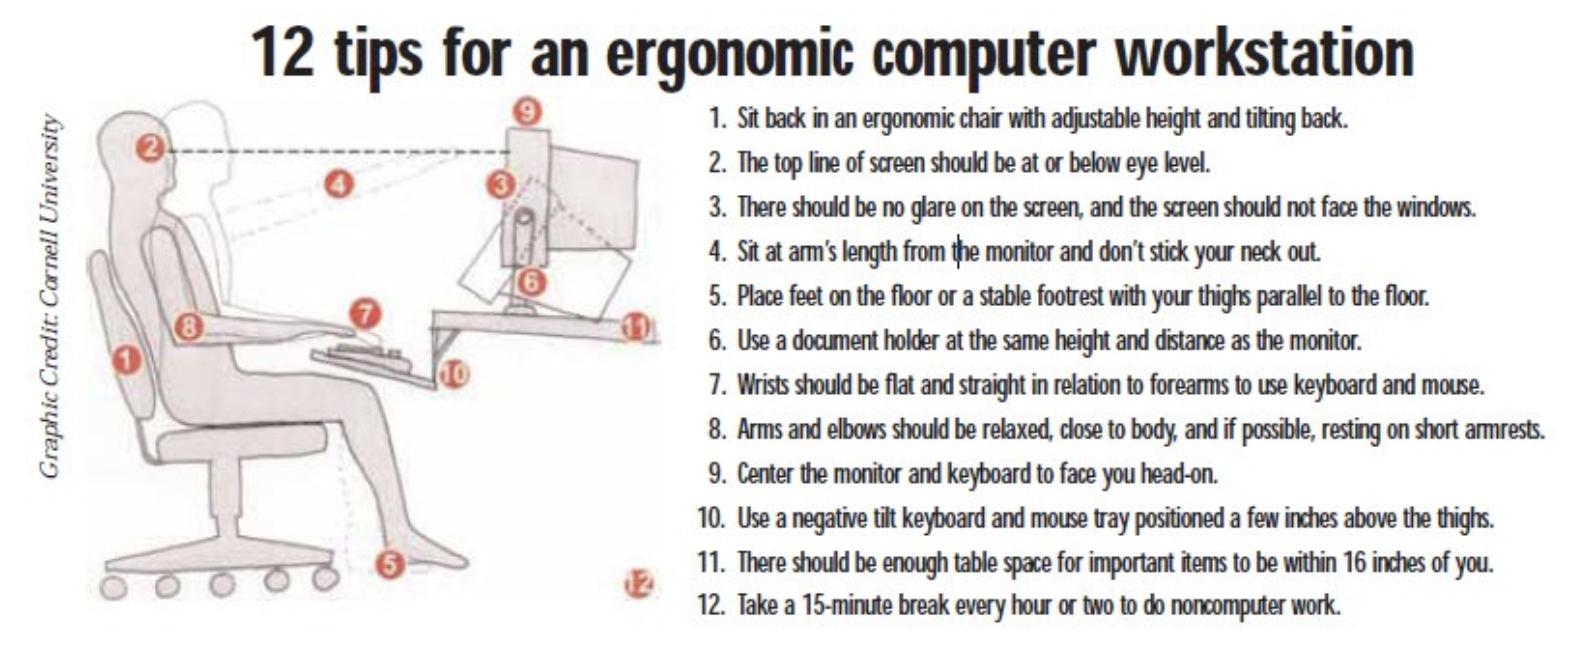 ergonomic tips.png